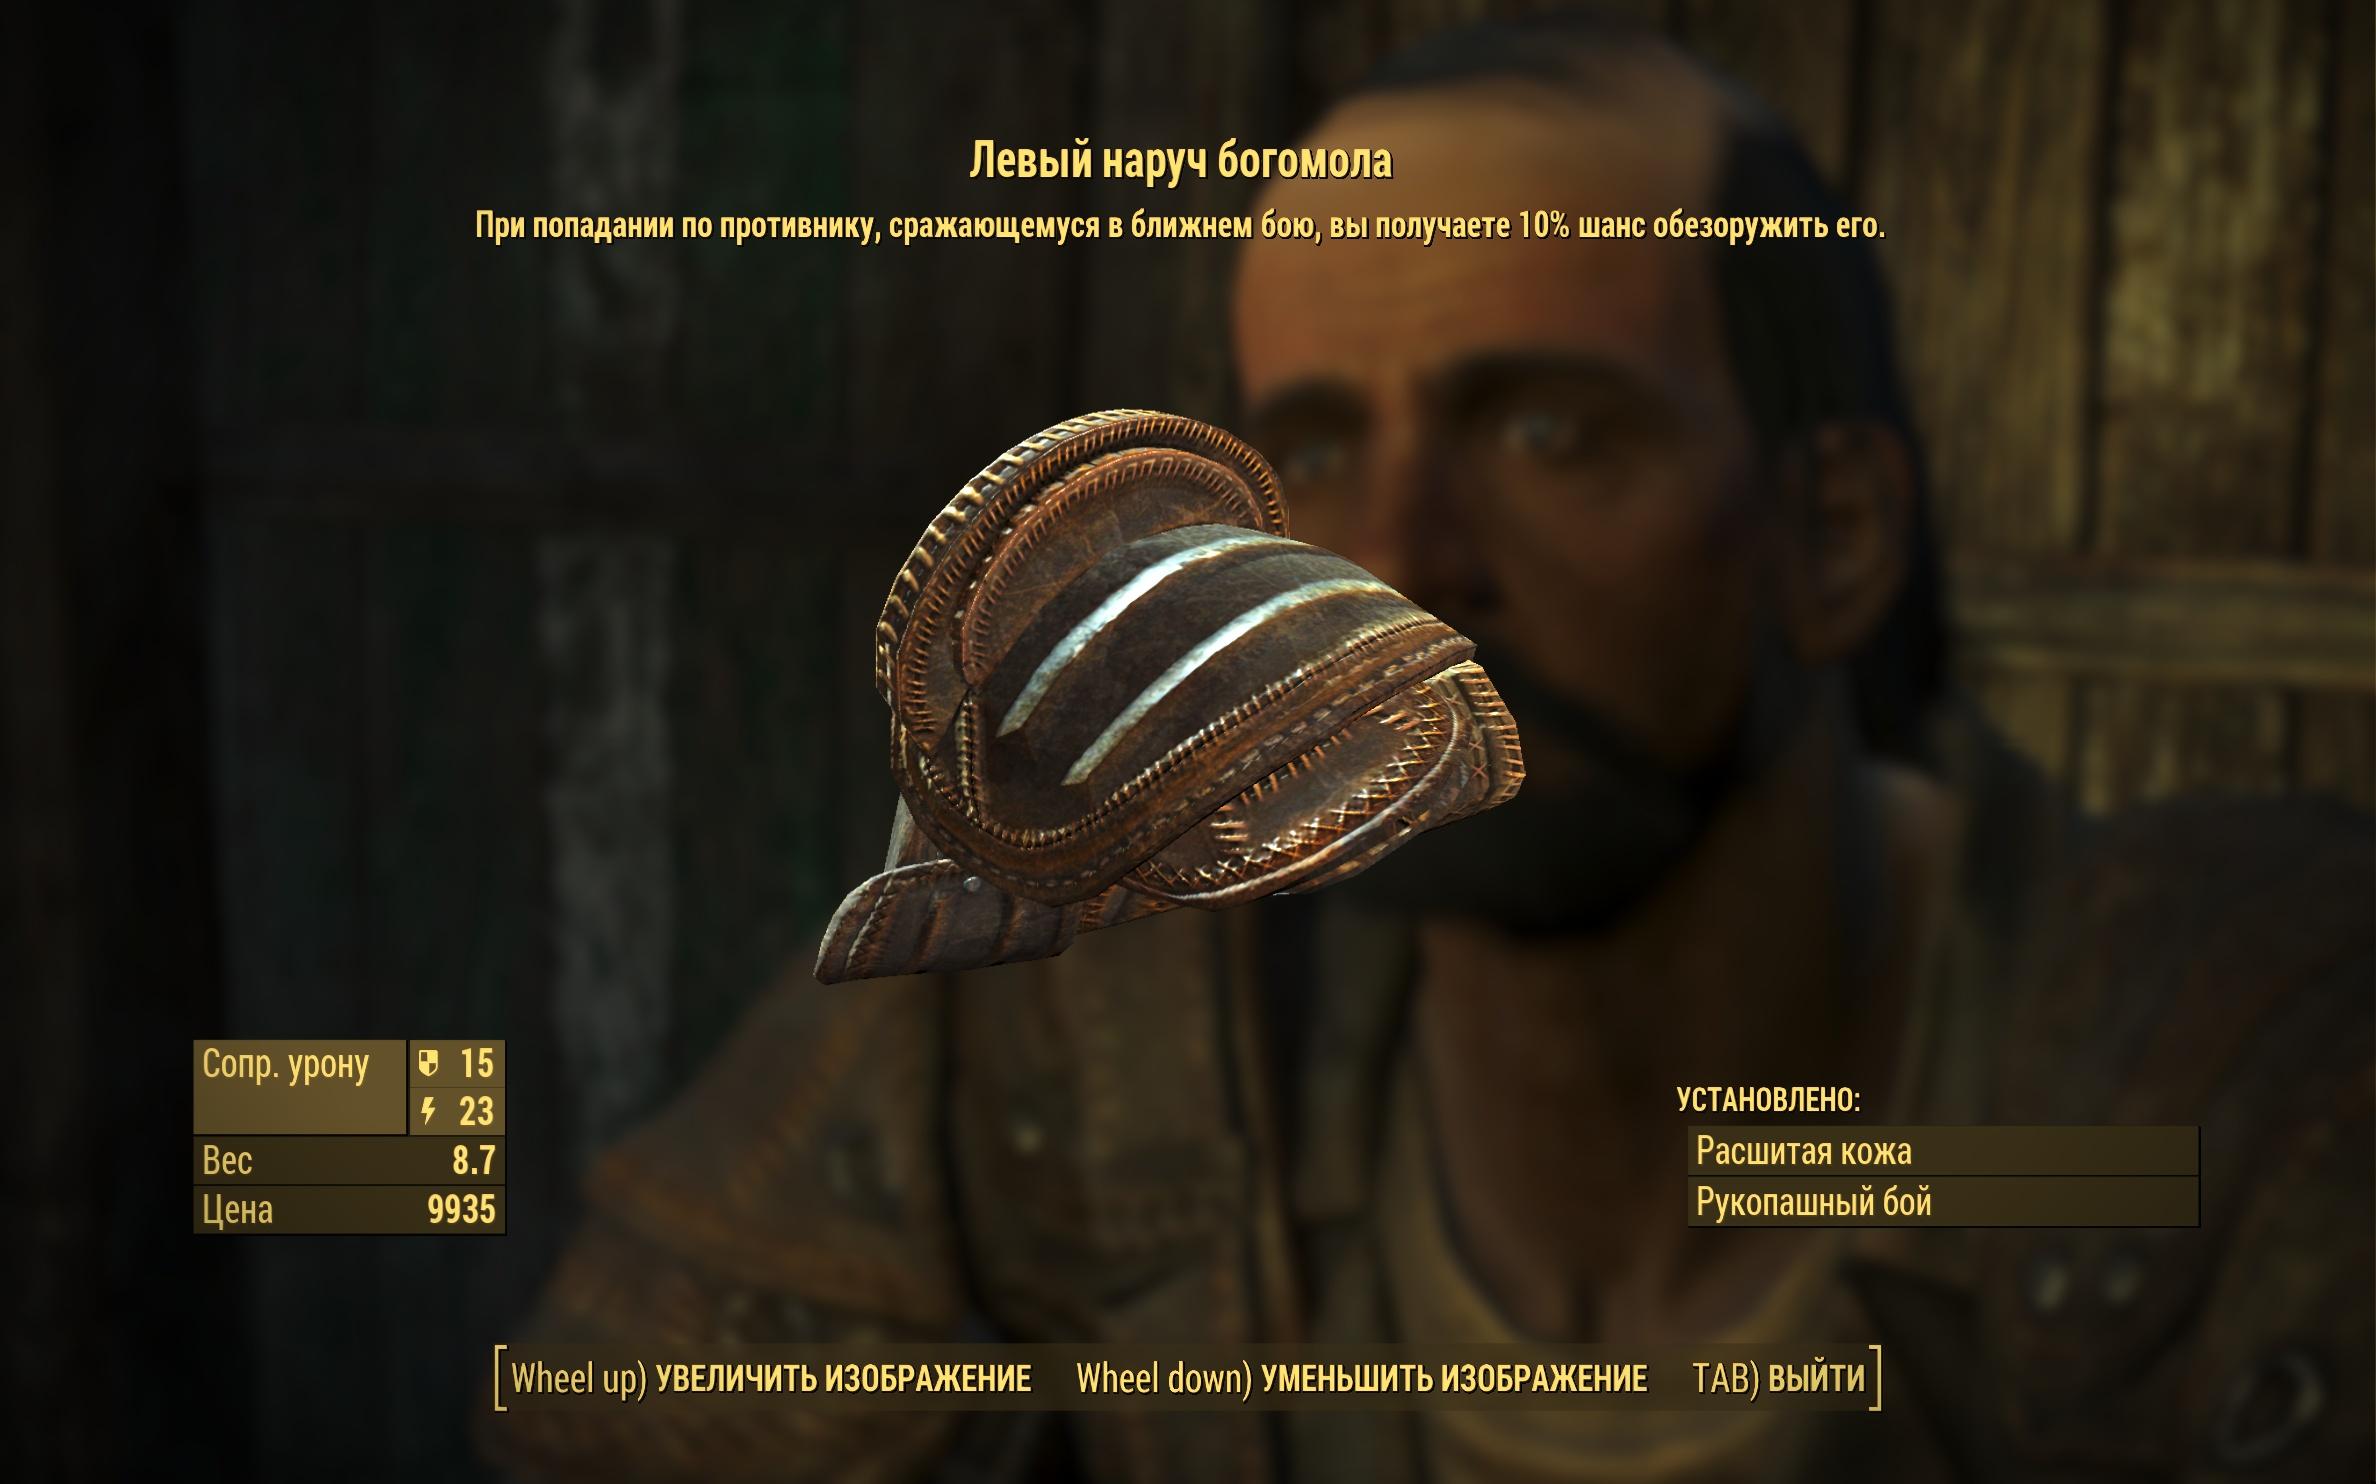 Левый наруч богомола - Fallout 4 богомол, Левый, наруч, Одежда